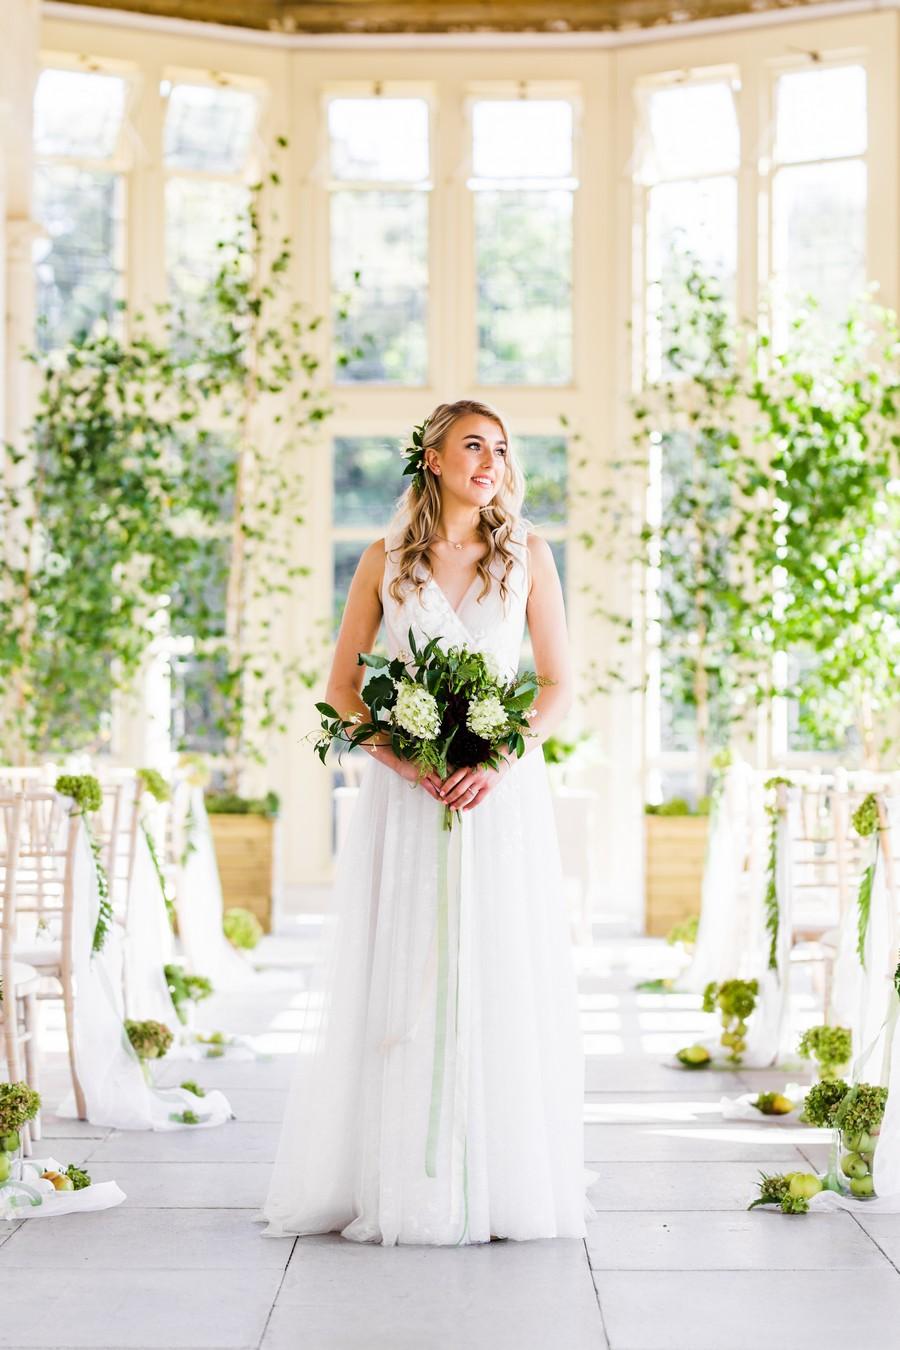 Highcliffe Castle wedding inspiration on the English Wedding Blog (14)